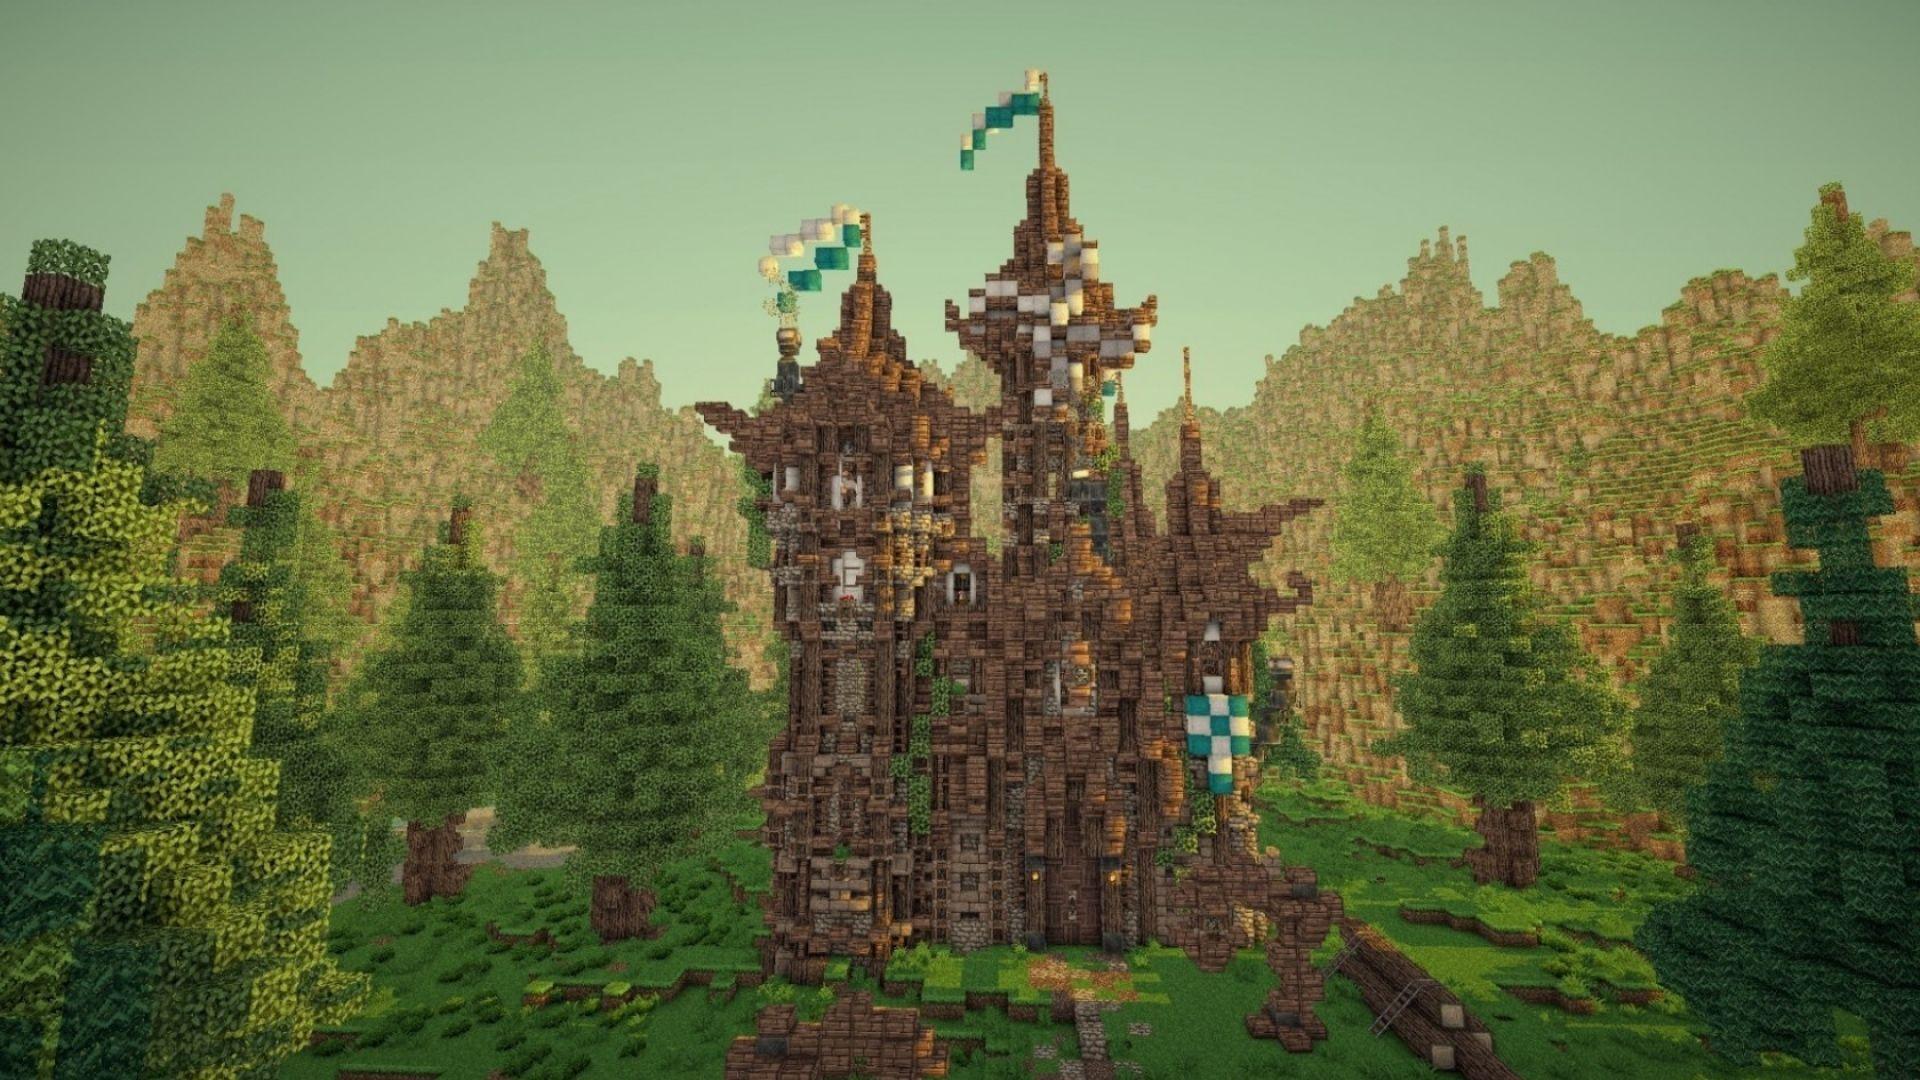 Minecraft Backgrounds Hd Wallpaper Hd Wallpapers